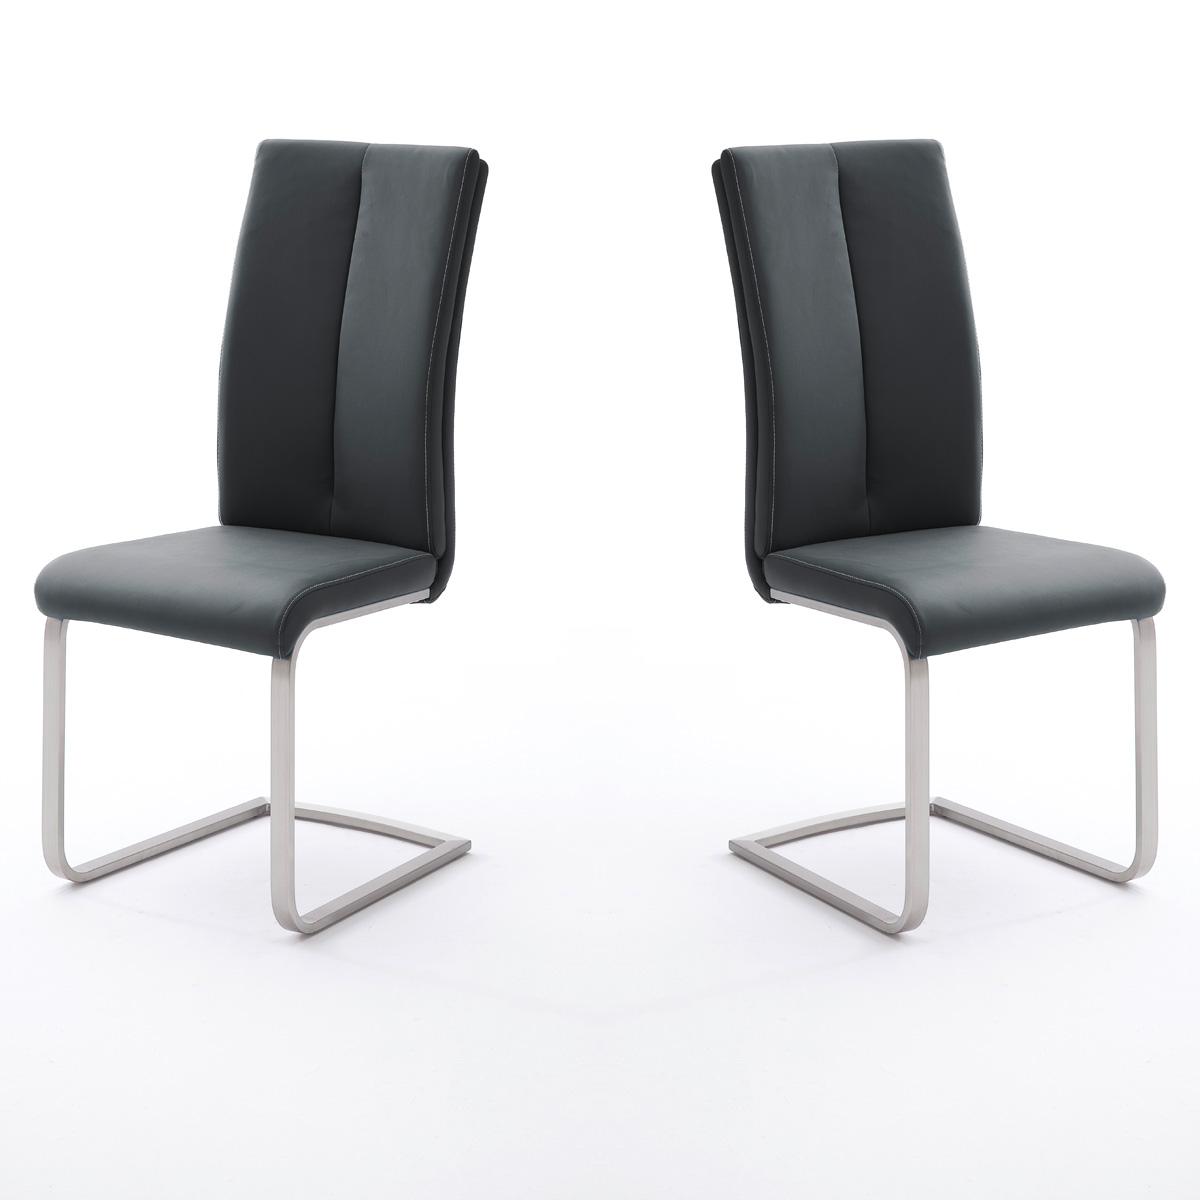 schwingstuhl 4er set paulo esszimmerstuhl stuhl cappuccino. Black Bedroom Furniture Sets. Home Design Ideas